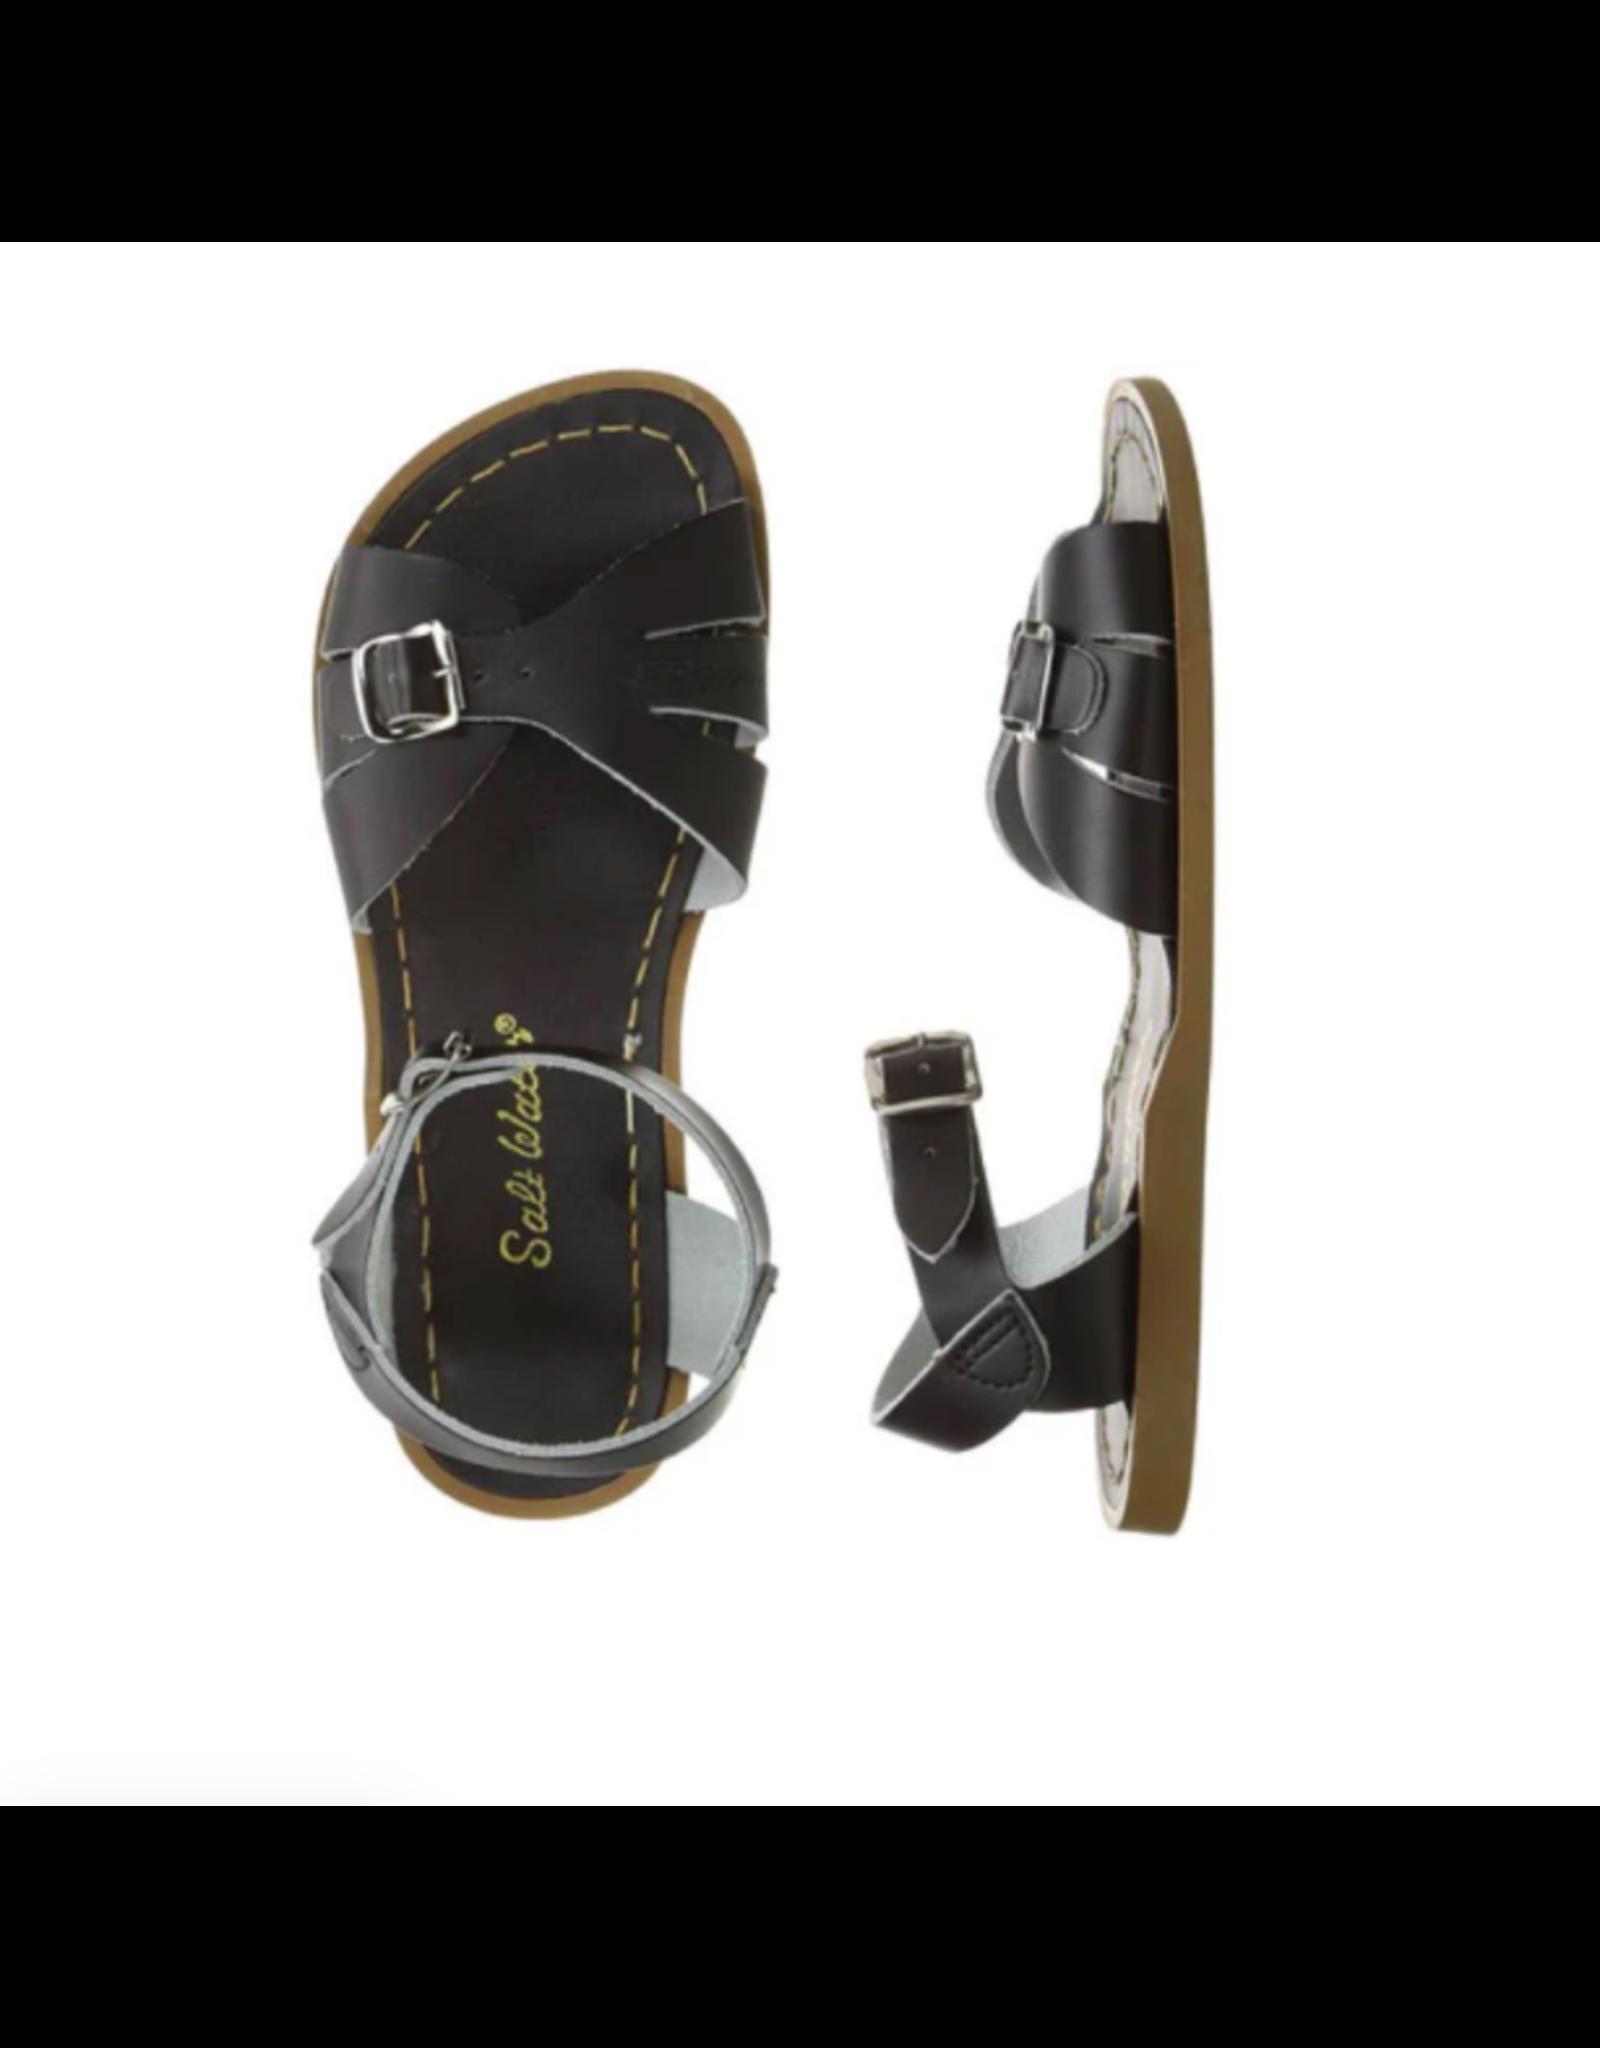 Salt Water Sandals Saltwater Sandals - Classic